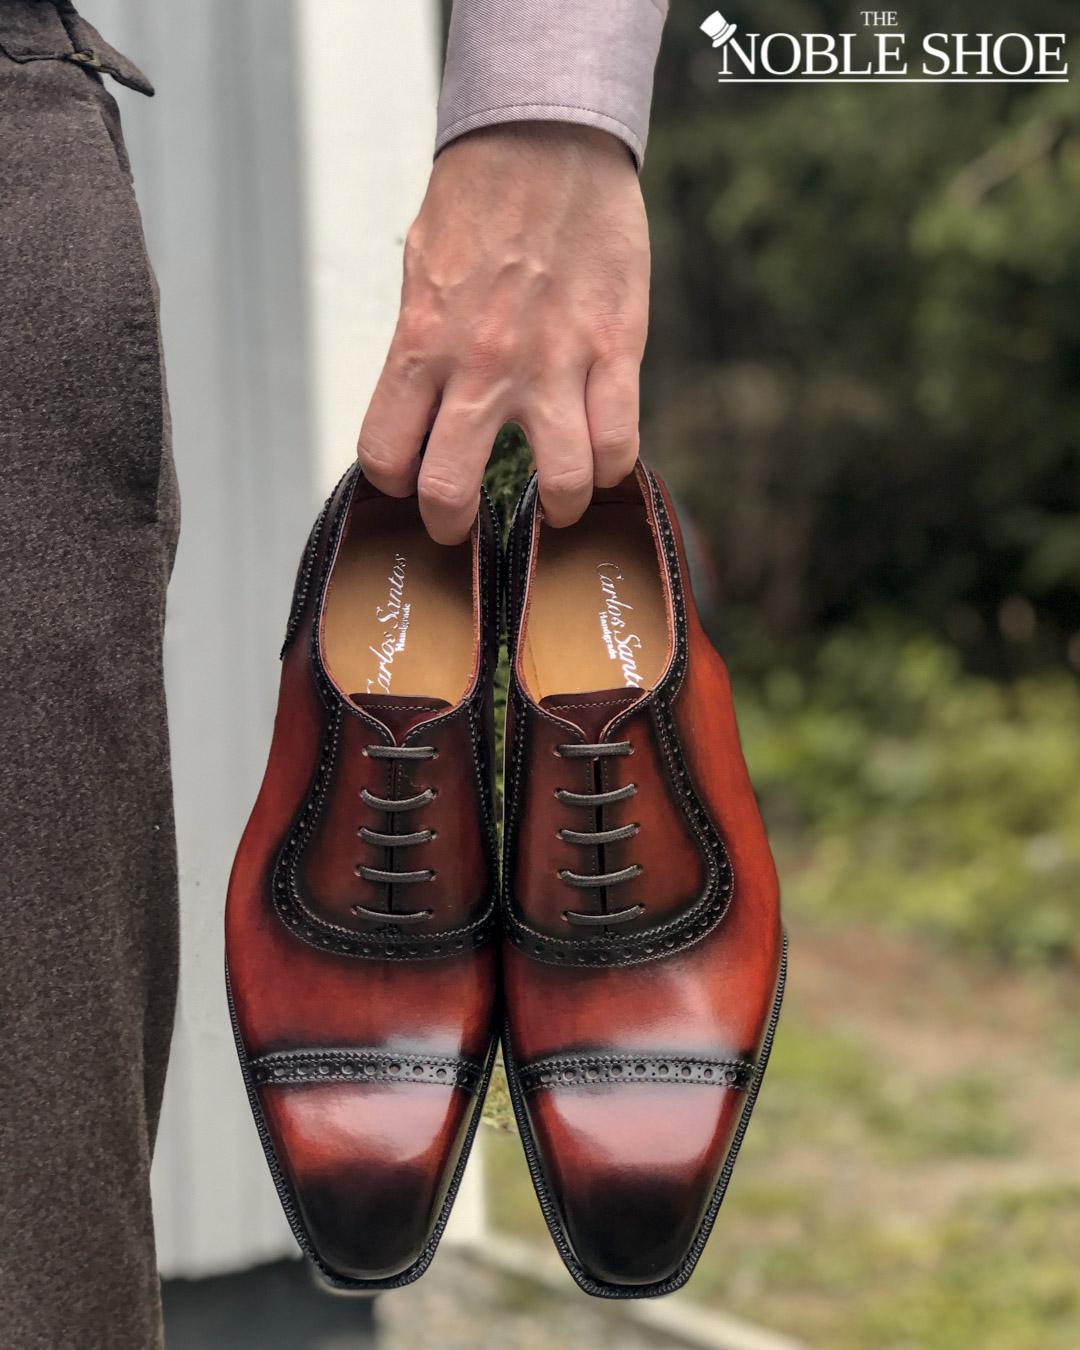 The Noble Shoe Handgrade Adelaide in Wine Shadow